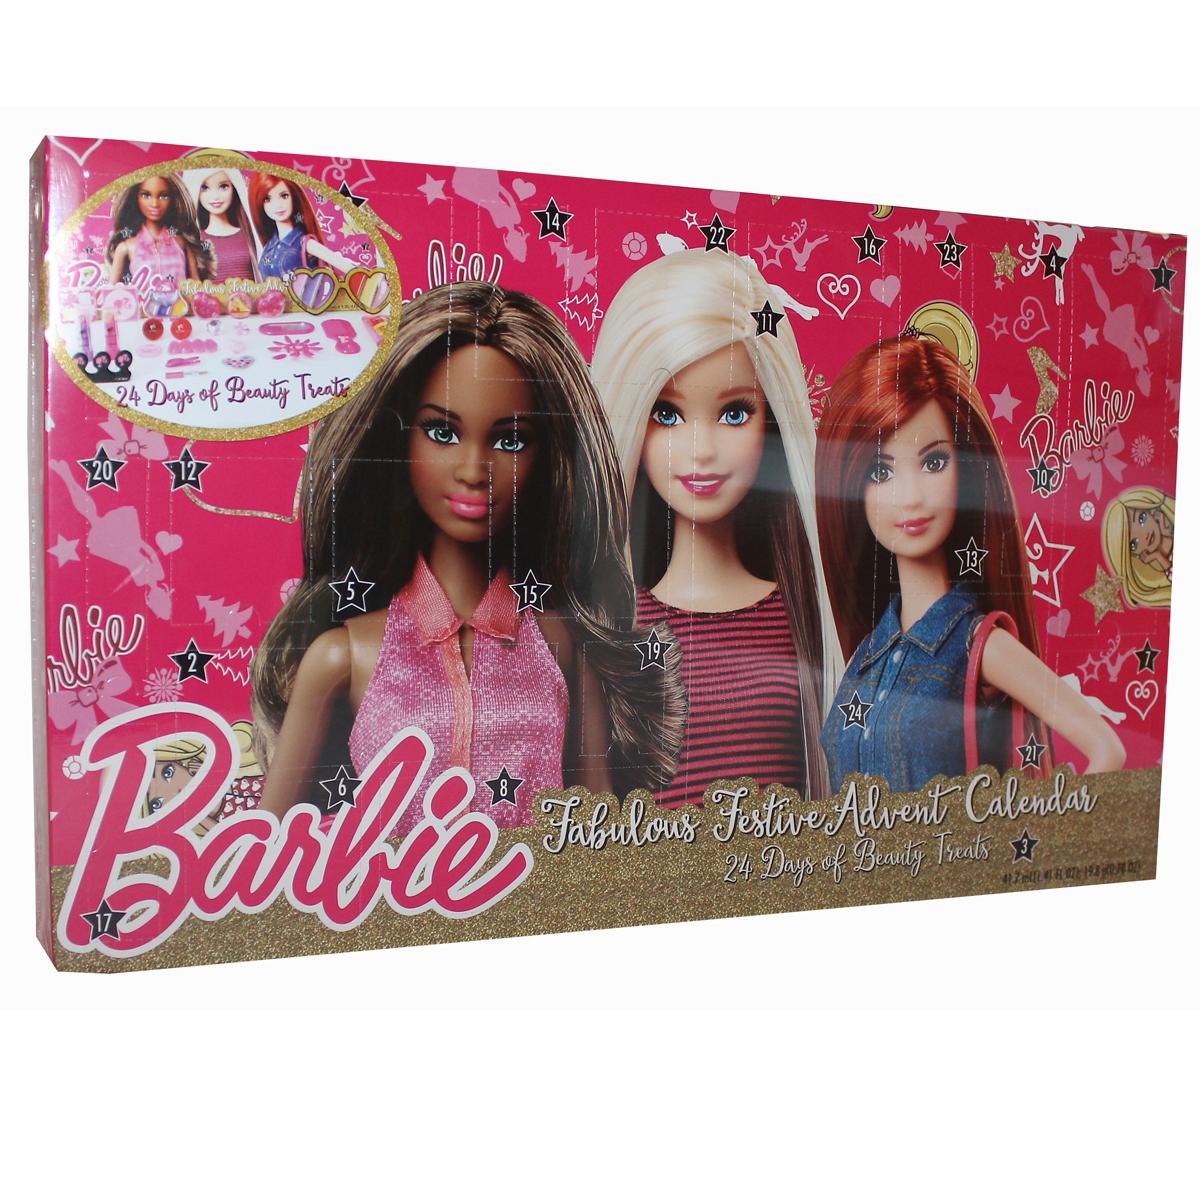 barbie adventskalender 2016 weihnachten kosmetik advent. Black Bedroom Furniture Sets. Home Design Ideas